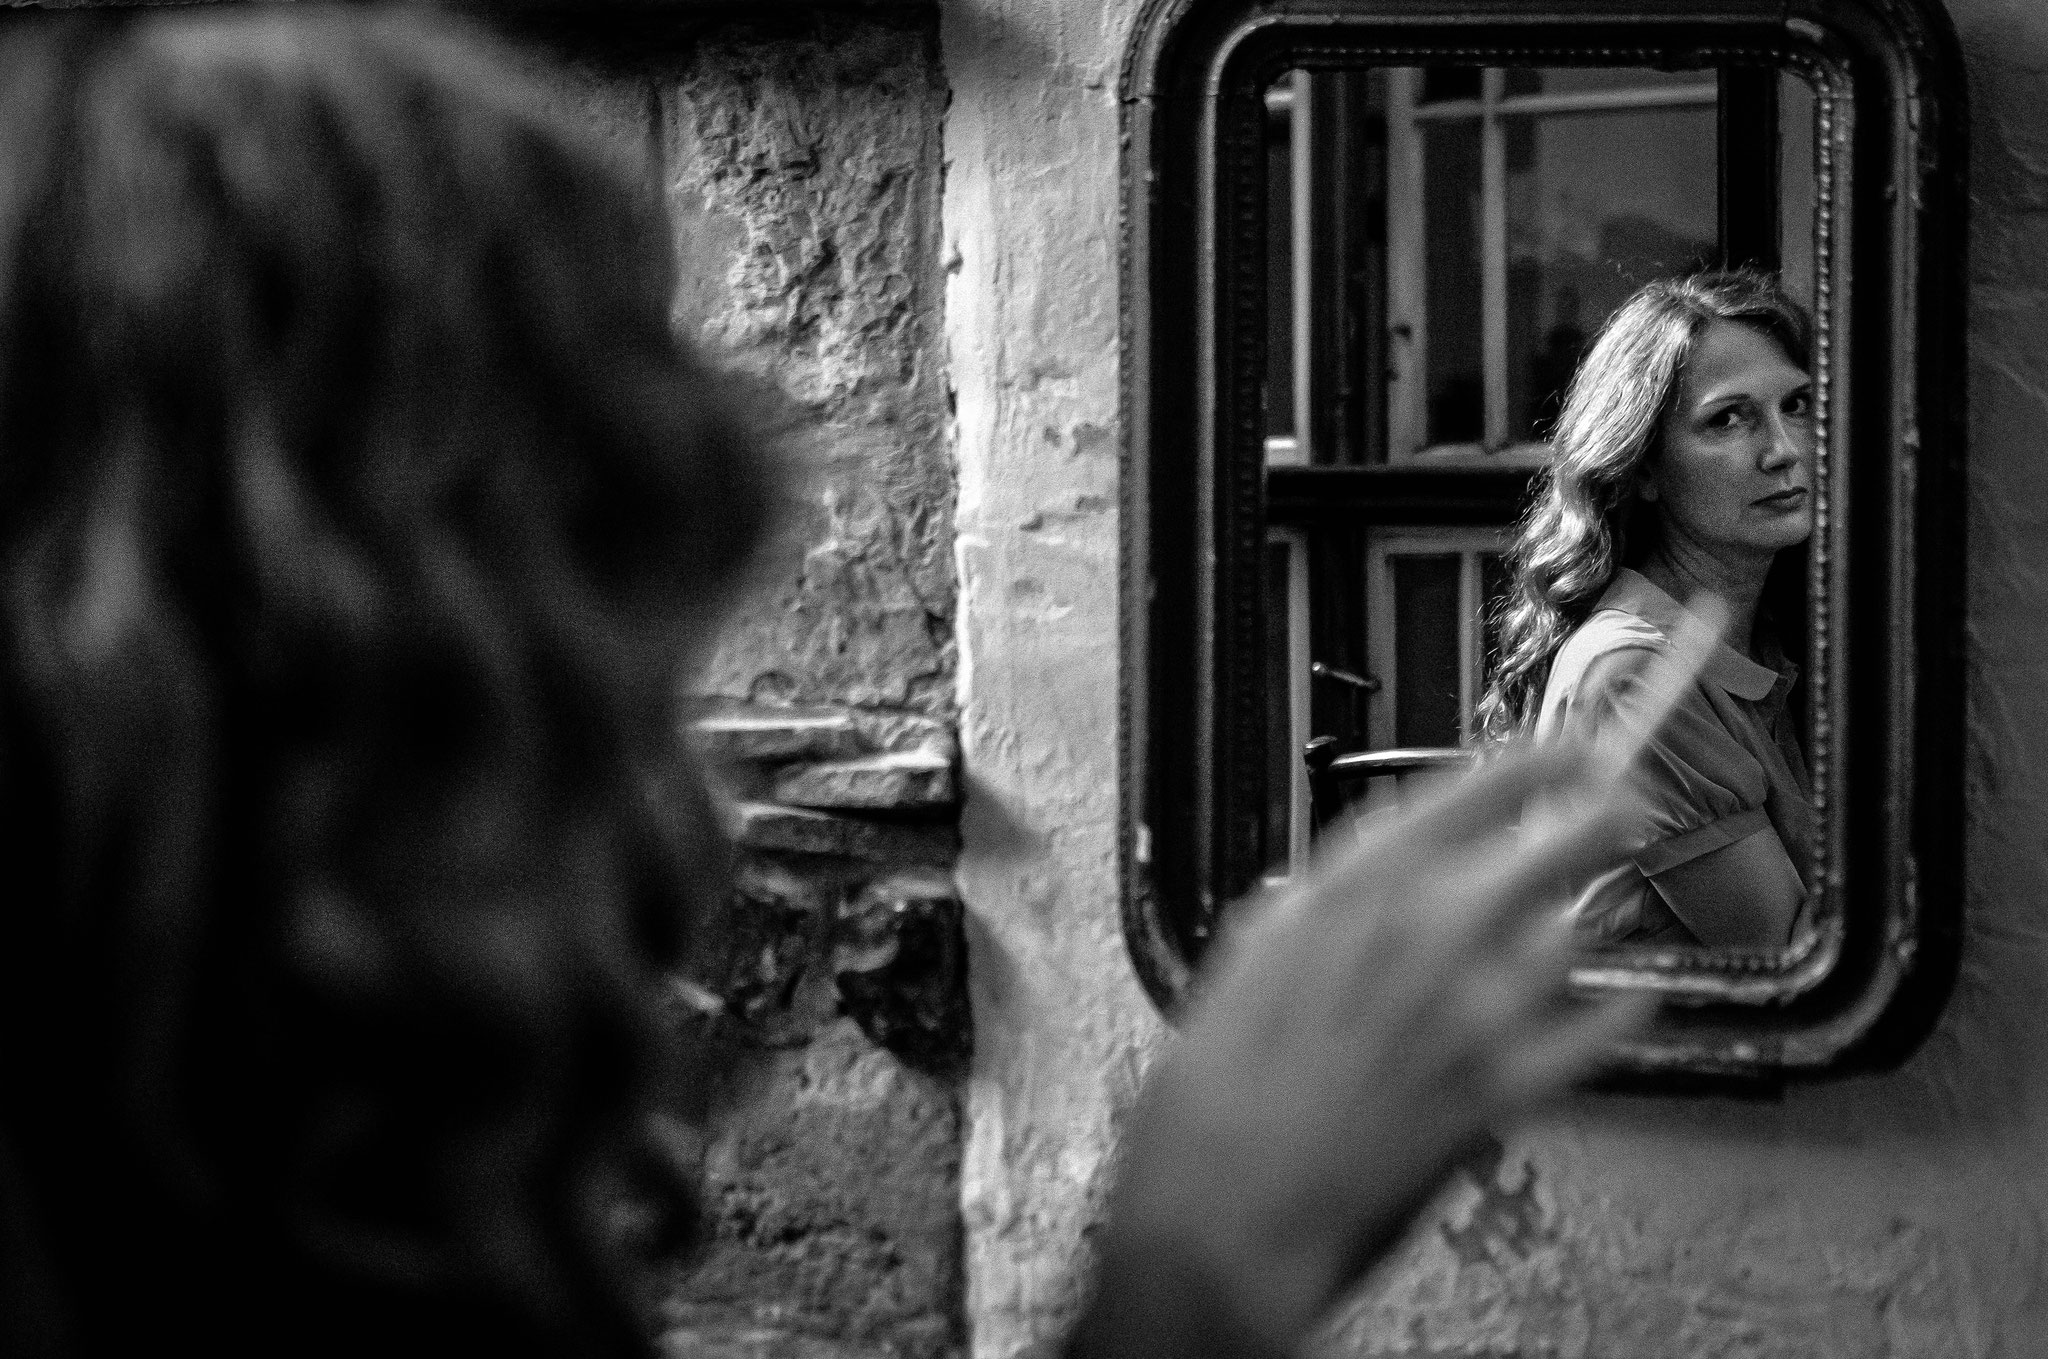 Dusan Kozoderovic (Serbia) - In the mirror